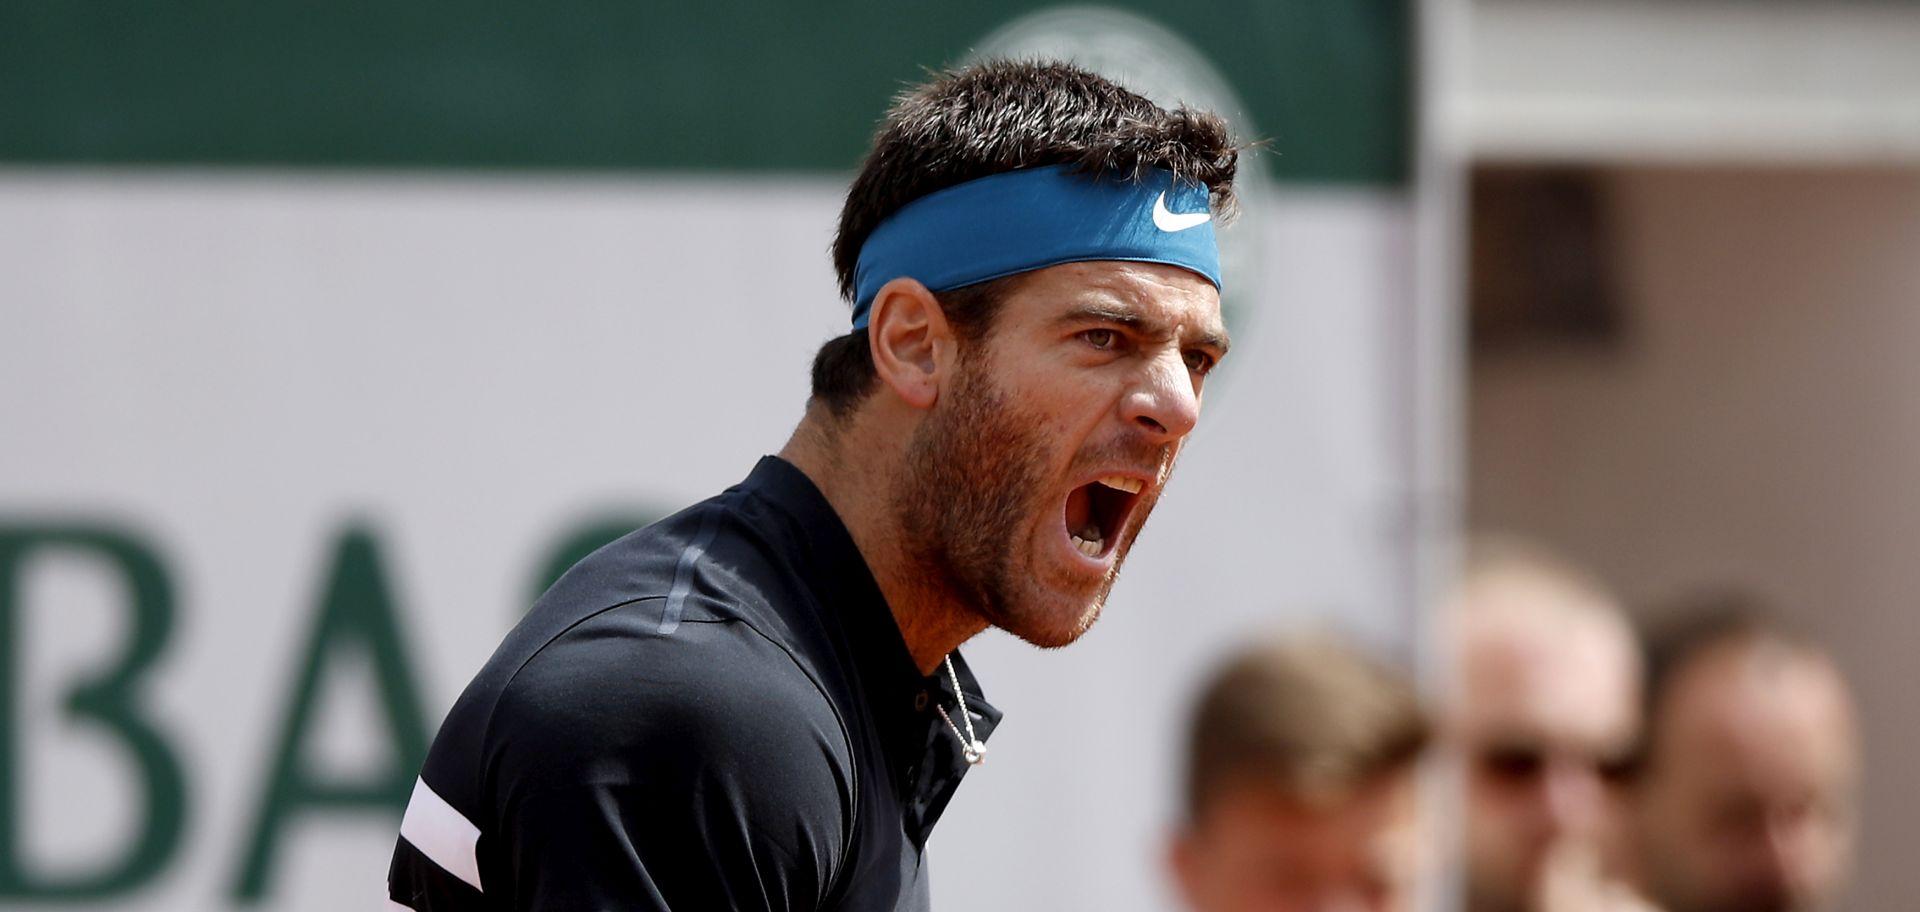 Roland Garros: Del Potro po 11. put svladao Čilića i prošao u polufinale